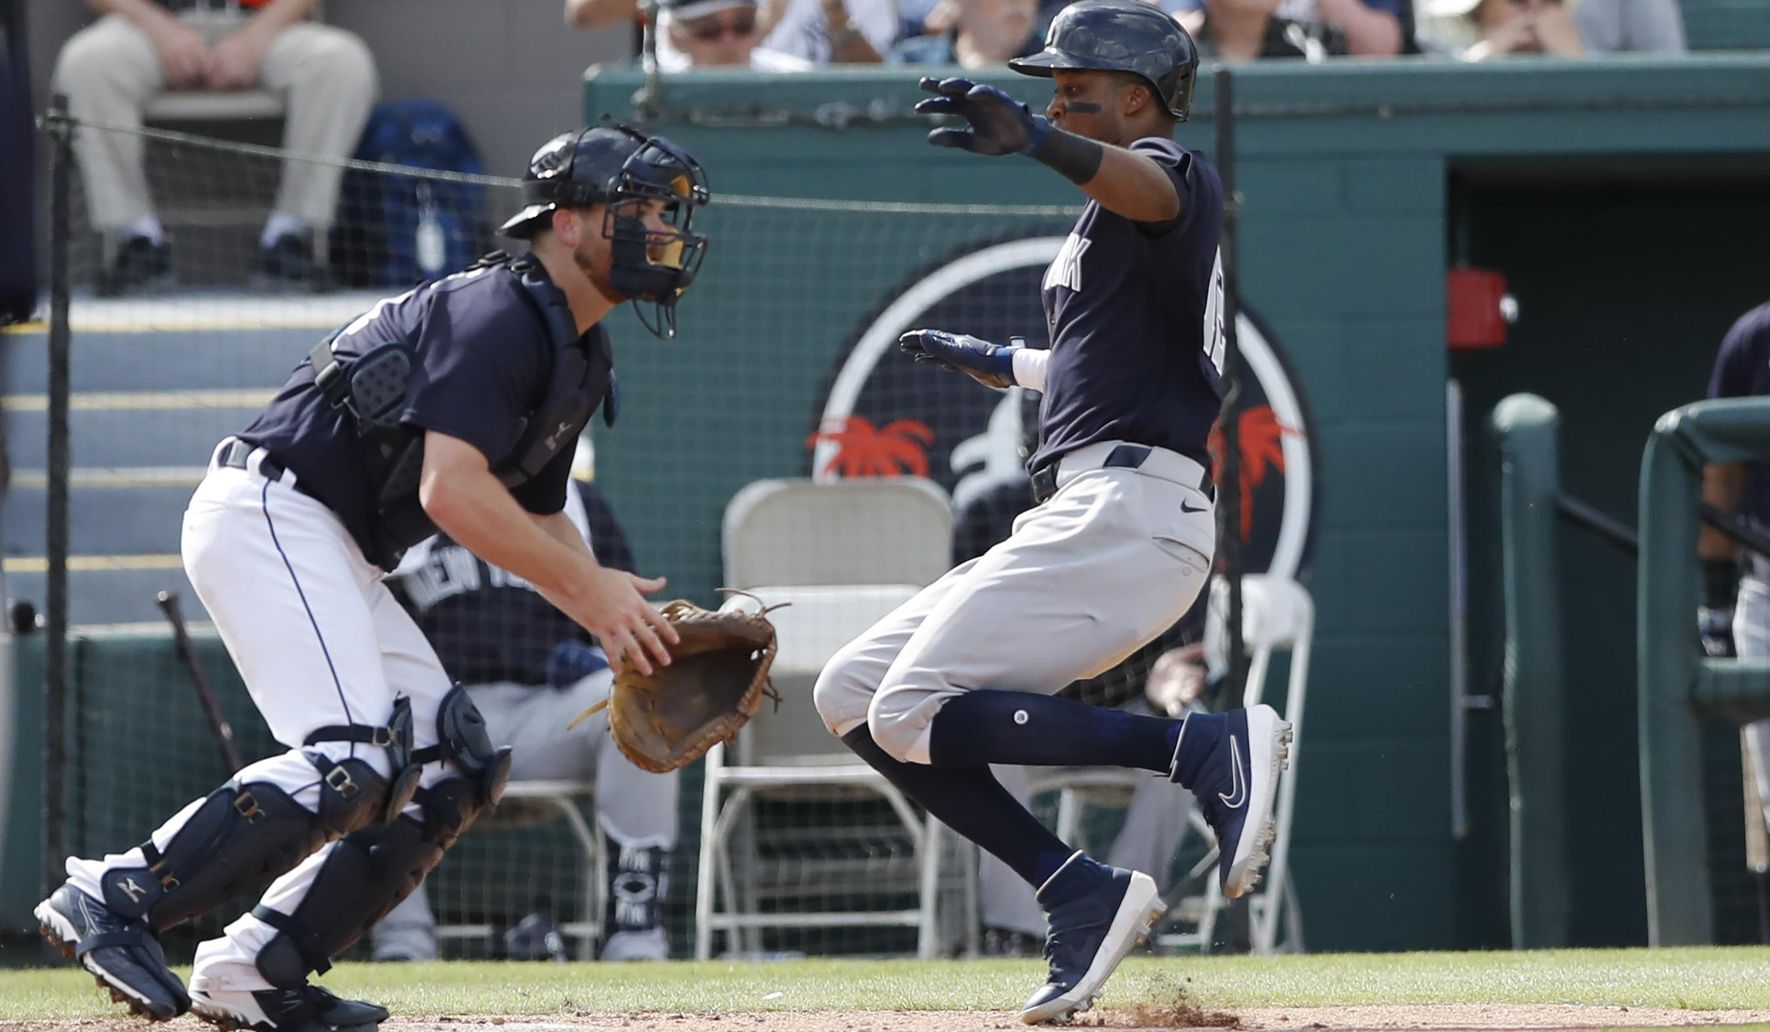 Yankees_tigers_spring_baseball_49838_c0-113-2700-1687_s1770x1032